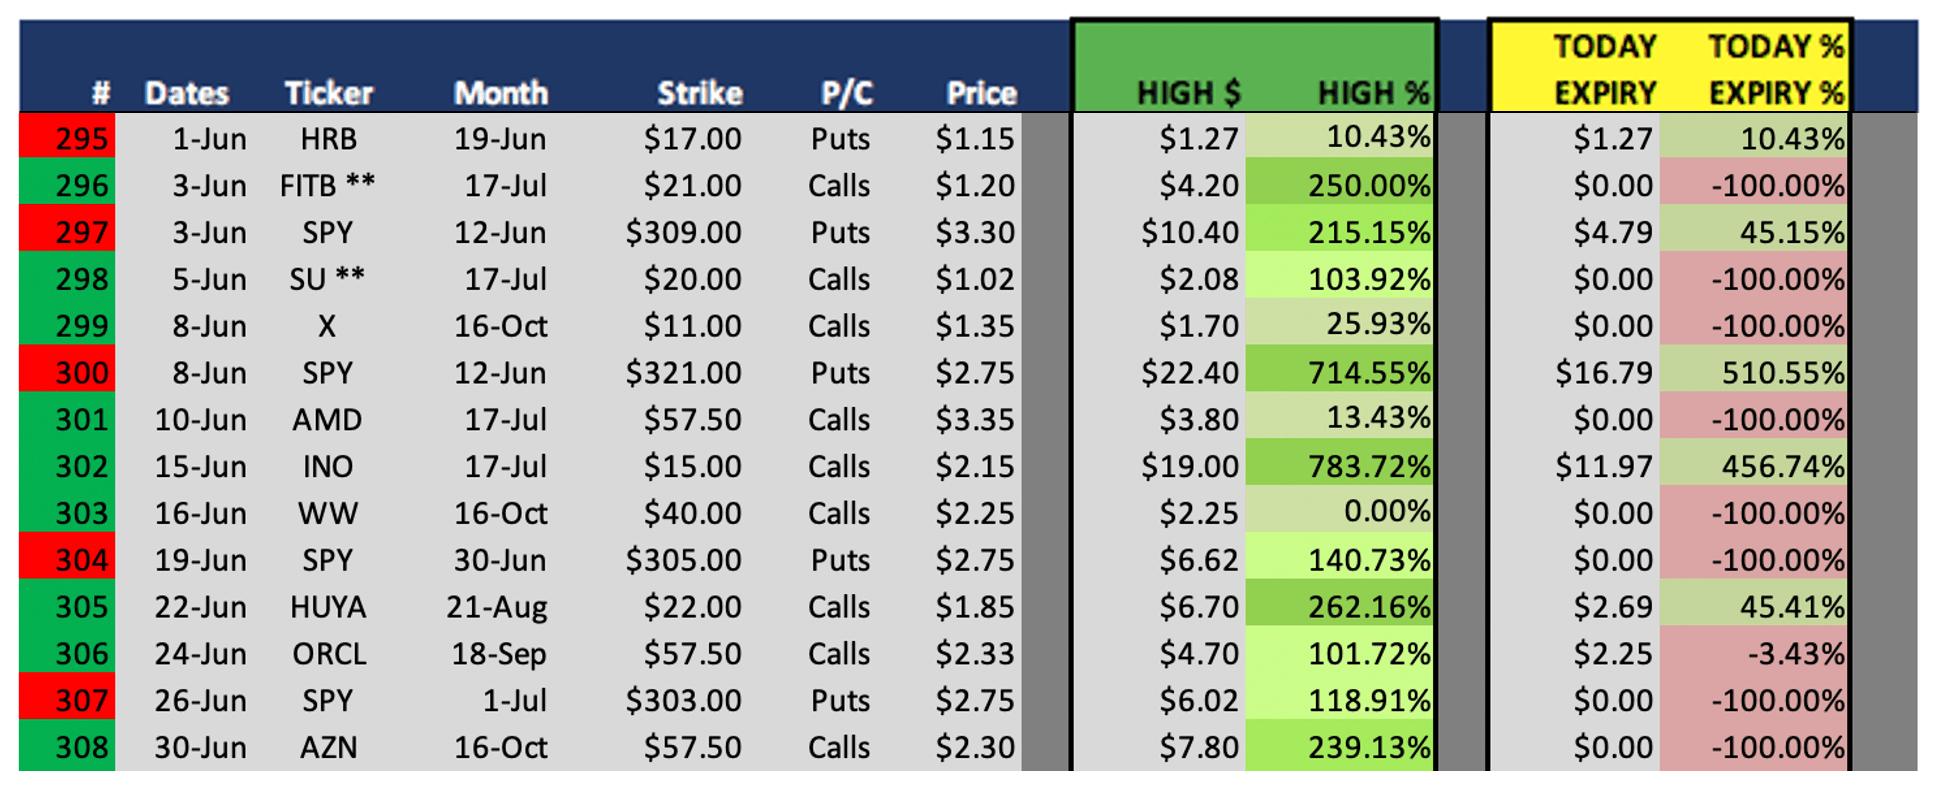 Best Options Trading Signals Winning Picks Weekly Results on June 30 295 thru 308